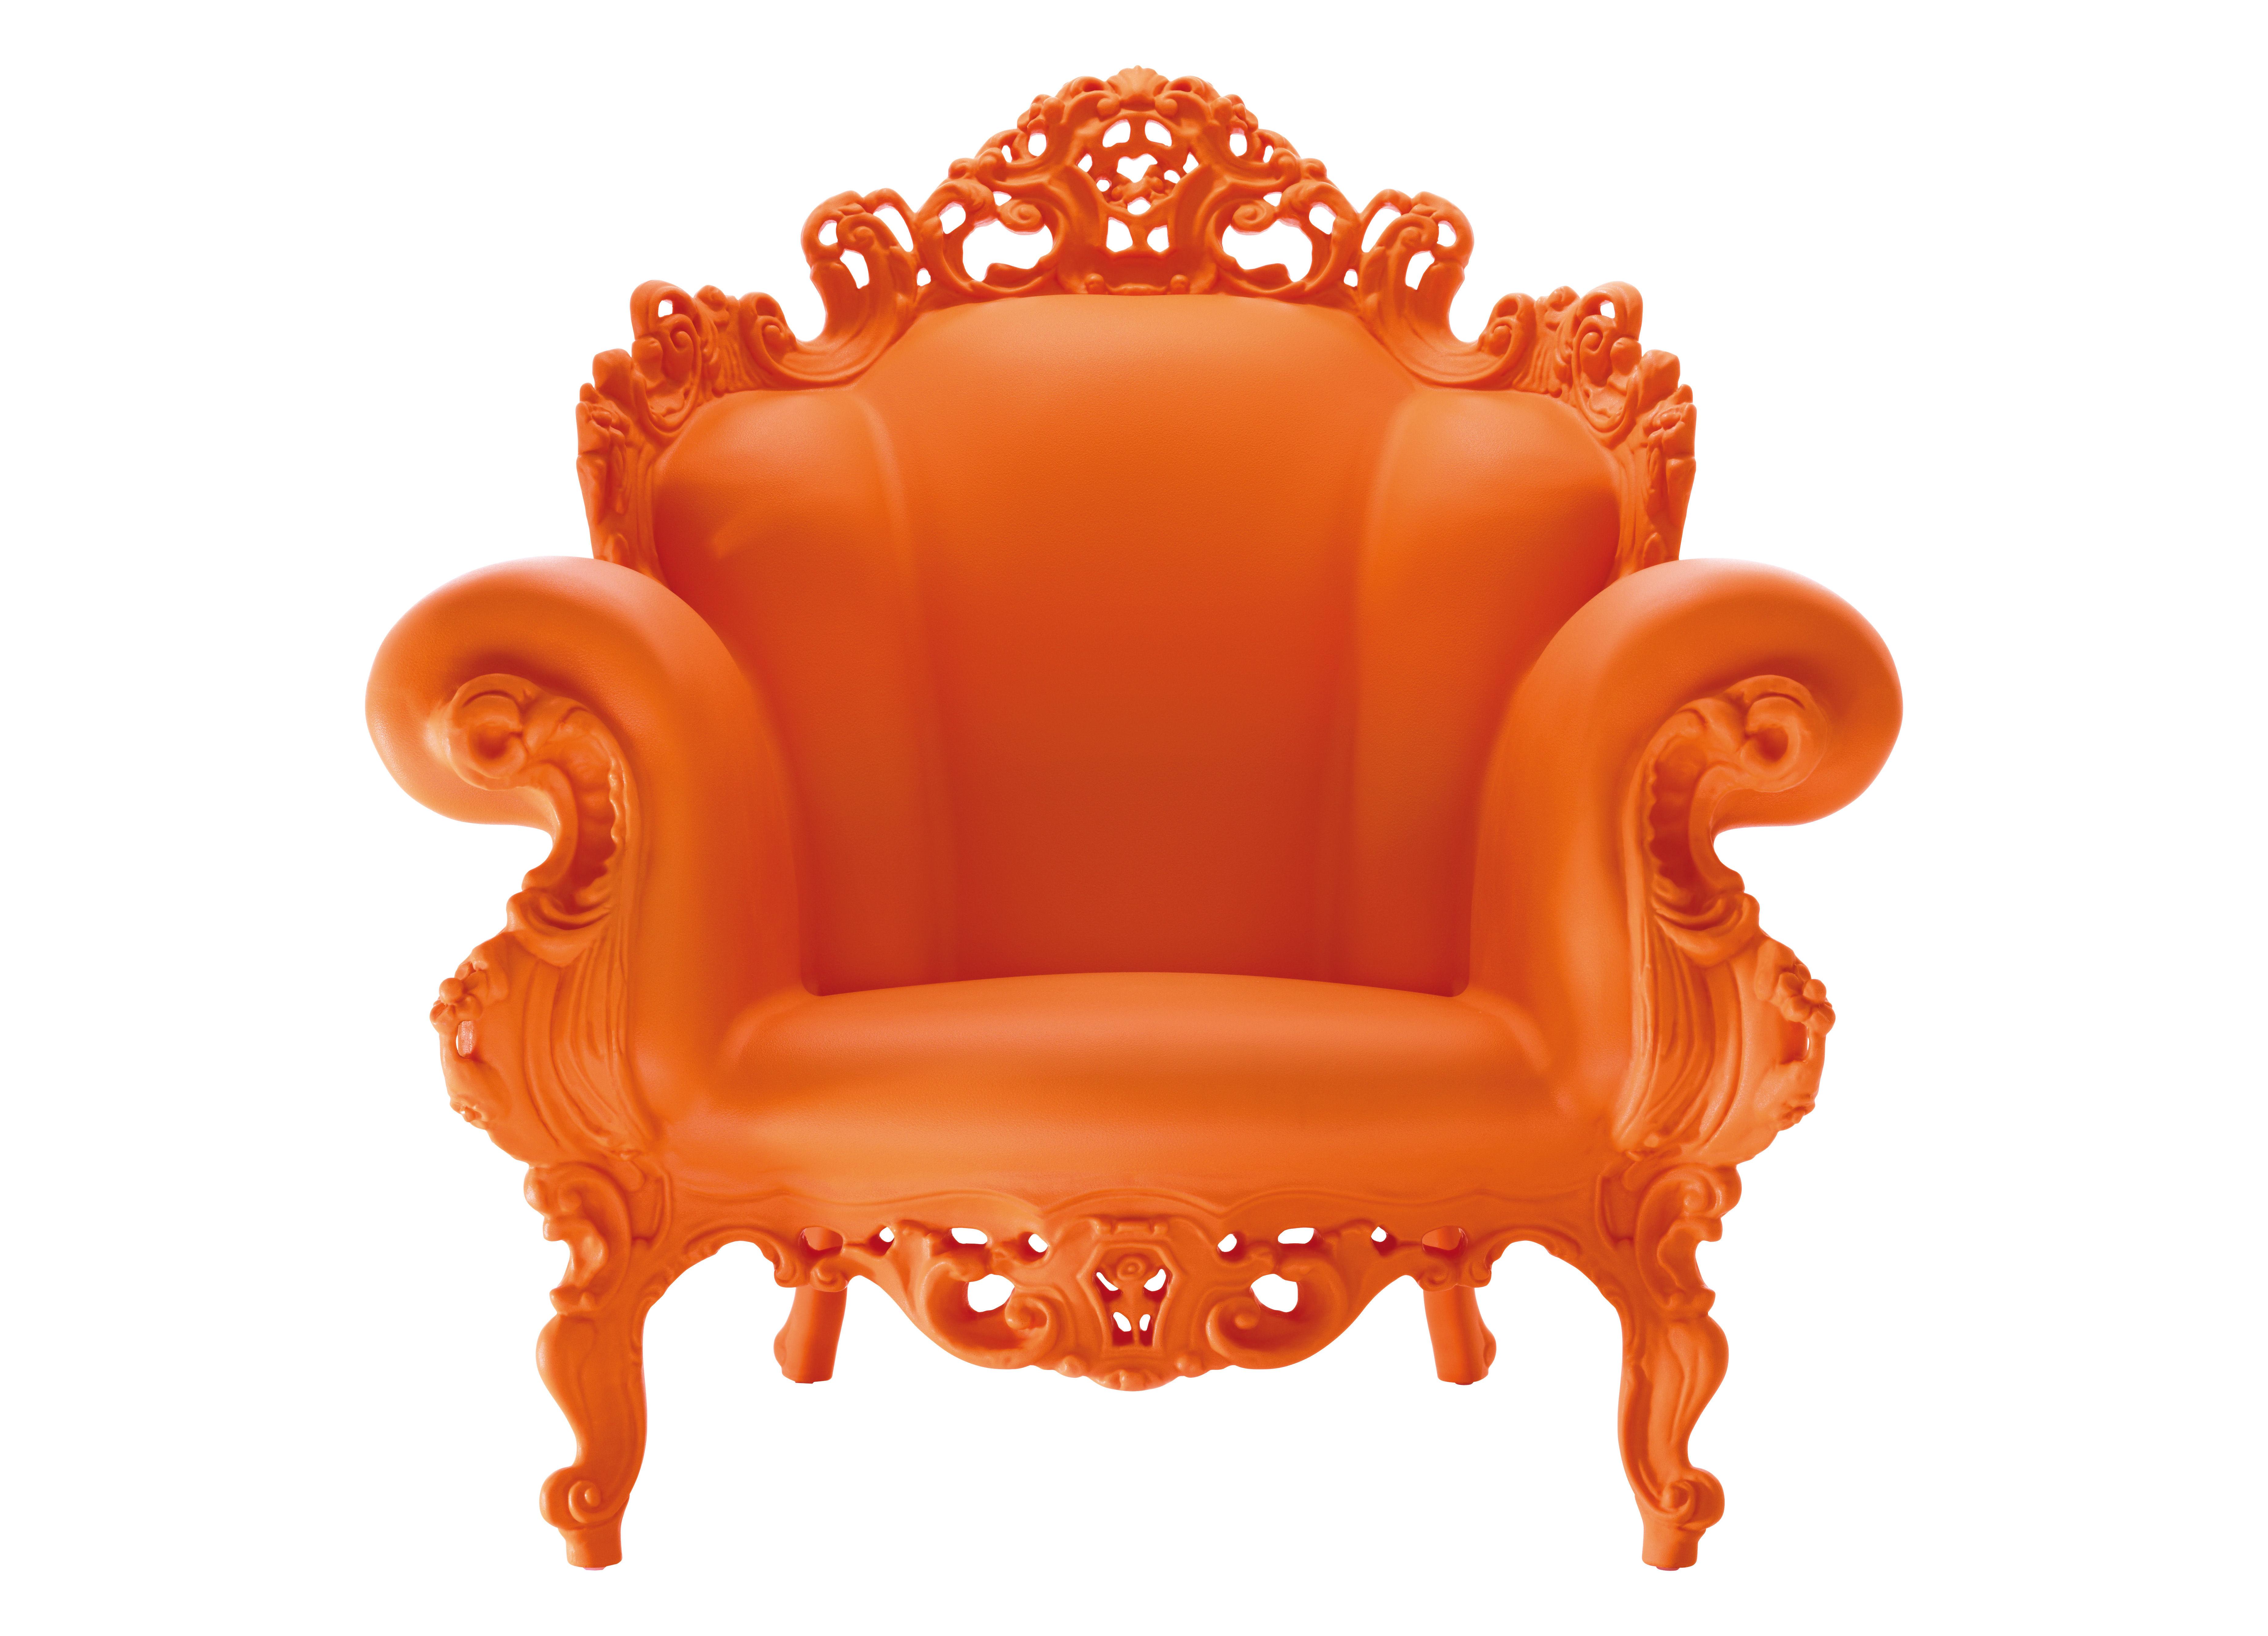 Magis proust armchair orange by magis for Magis chair